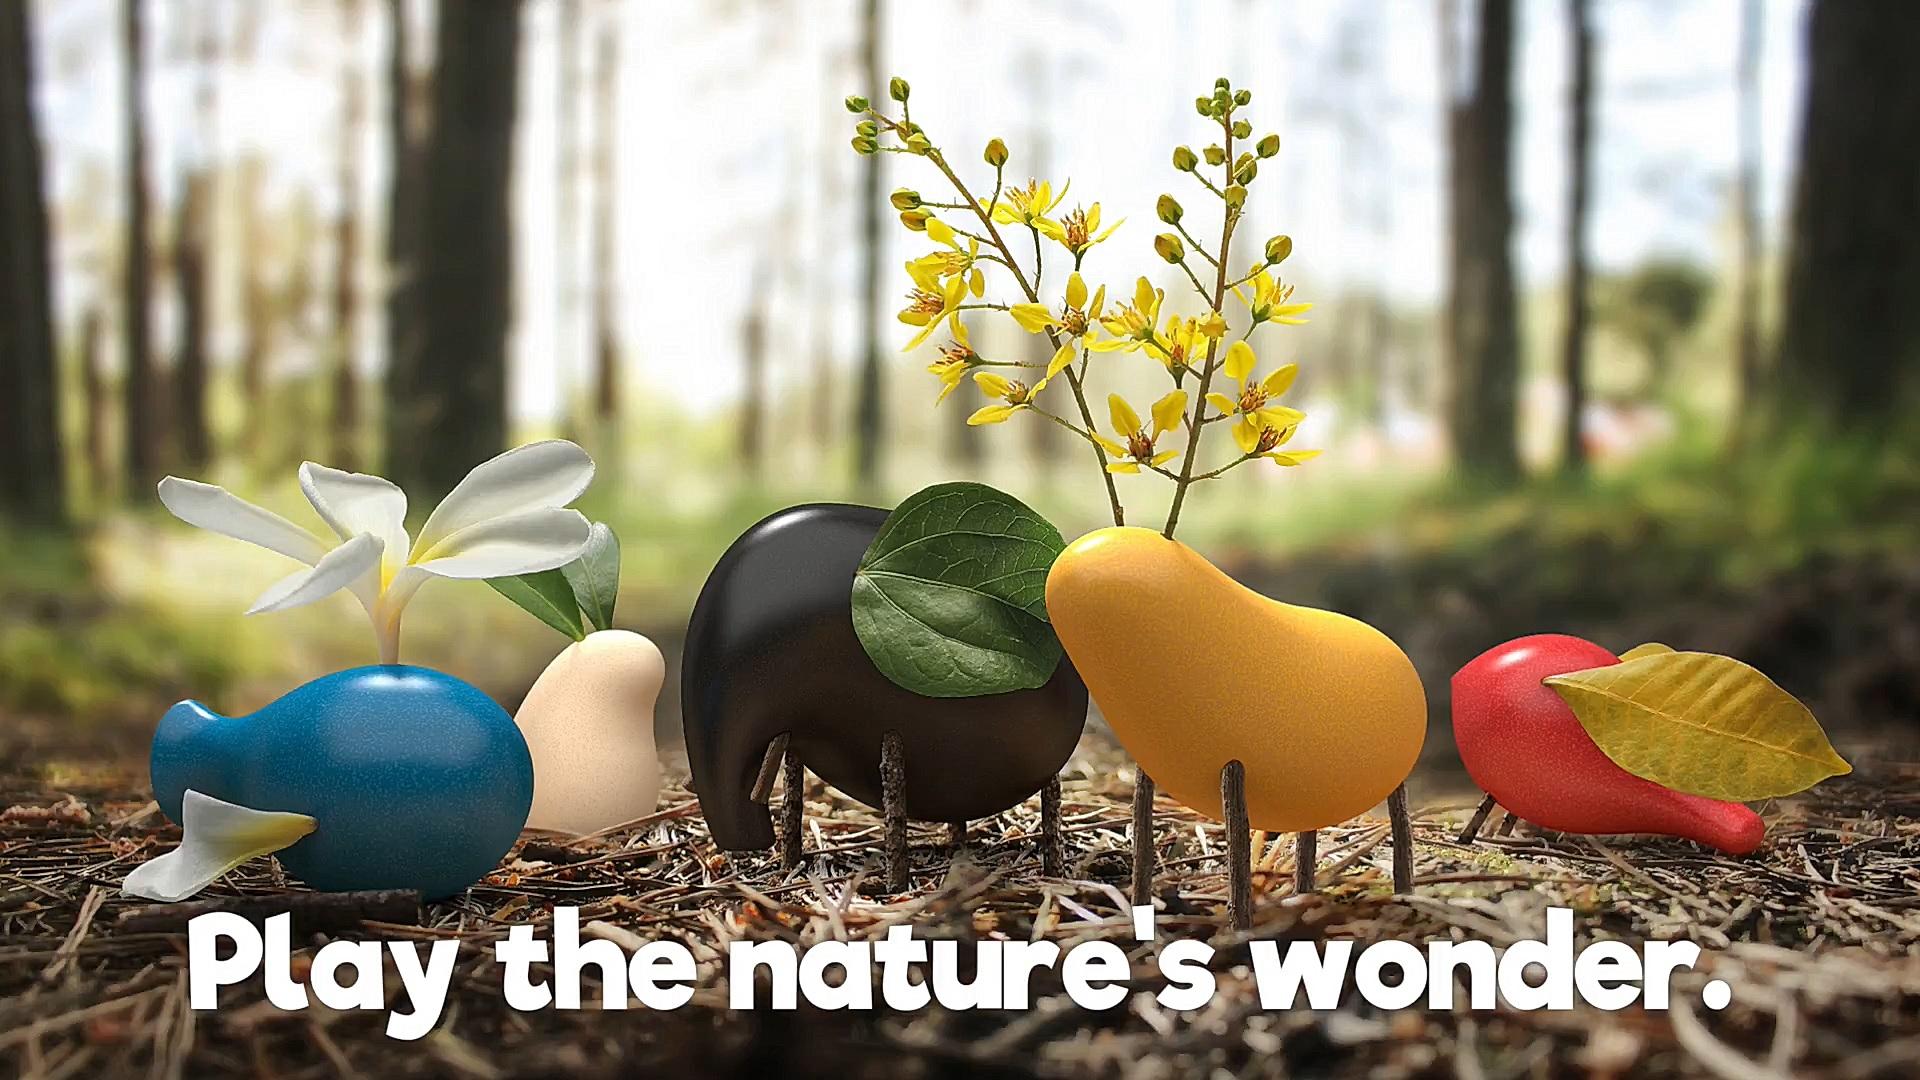 LOCOMO ของเล่นรักษ์โลก เสริมจินตนาการ ให้เด็กกลับไปใกล้ชิดธรรมชาติอีกครั้ง